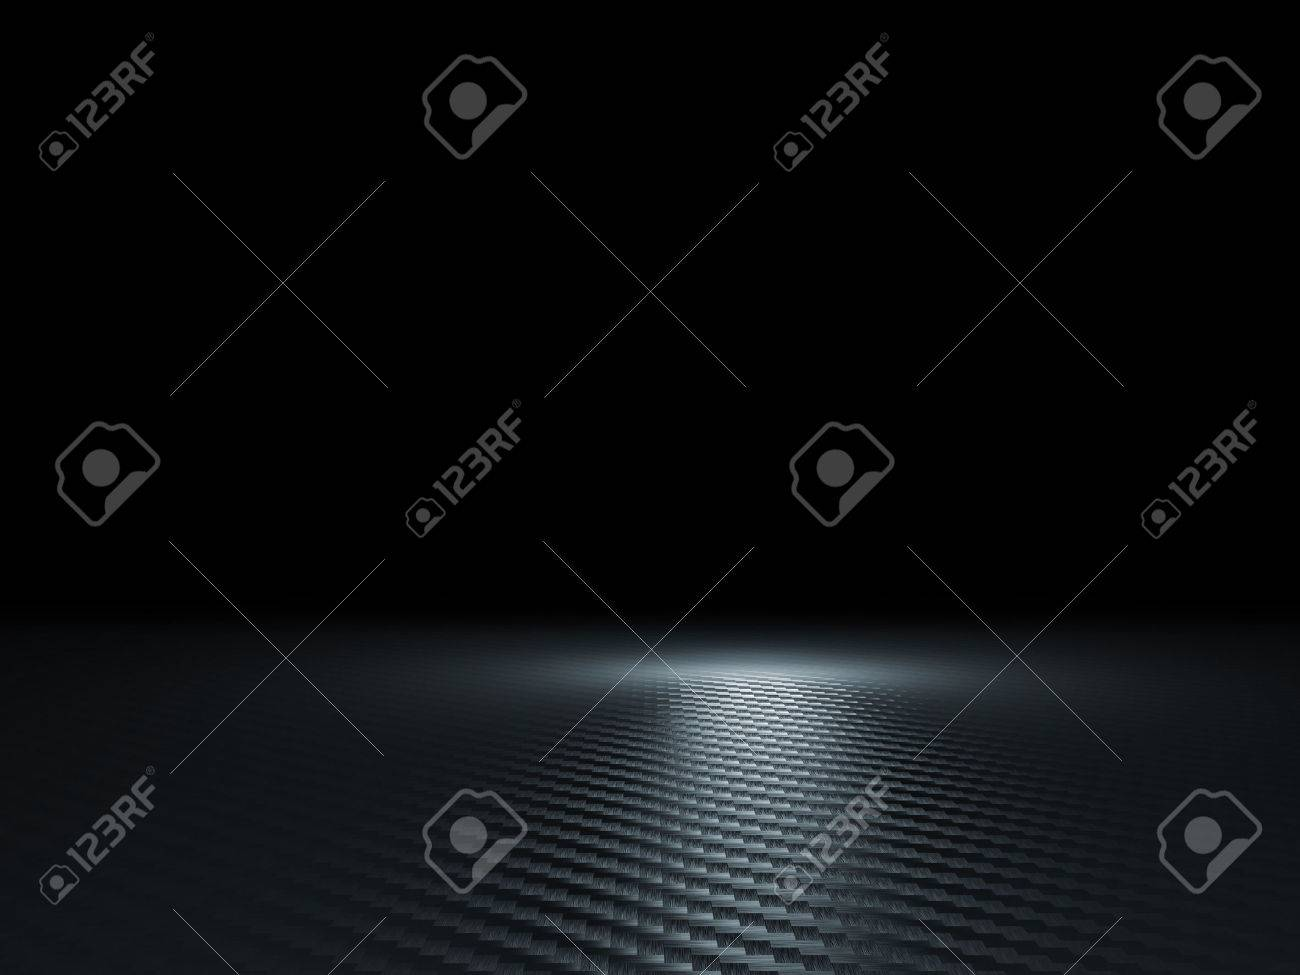 3d image of classic carbon fiber texture - 46058434